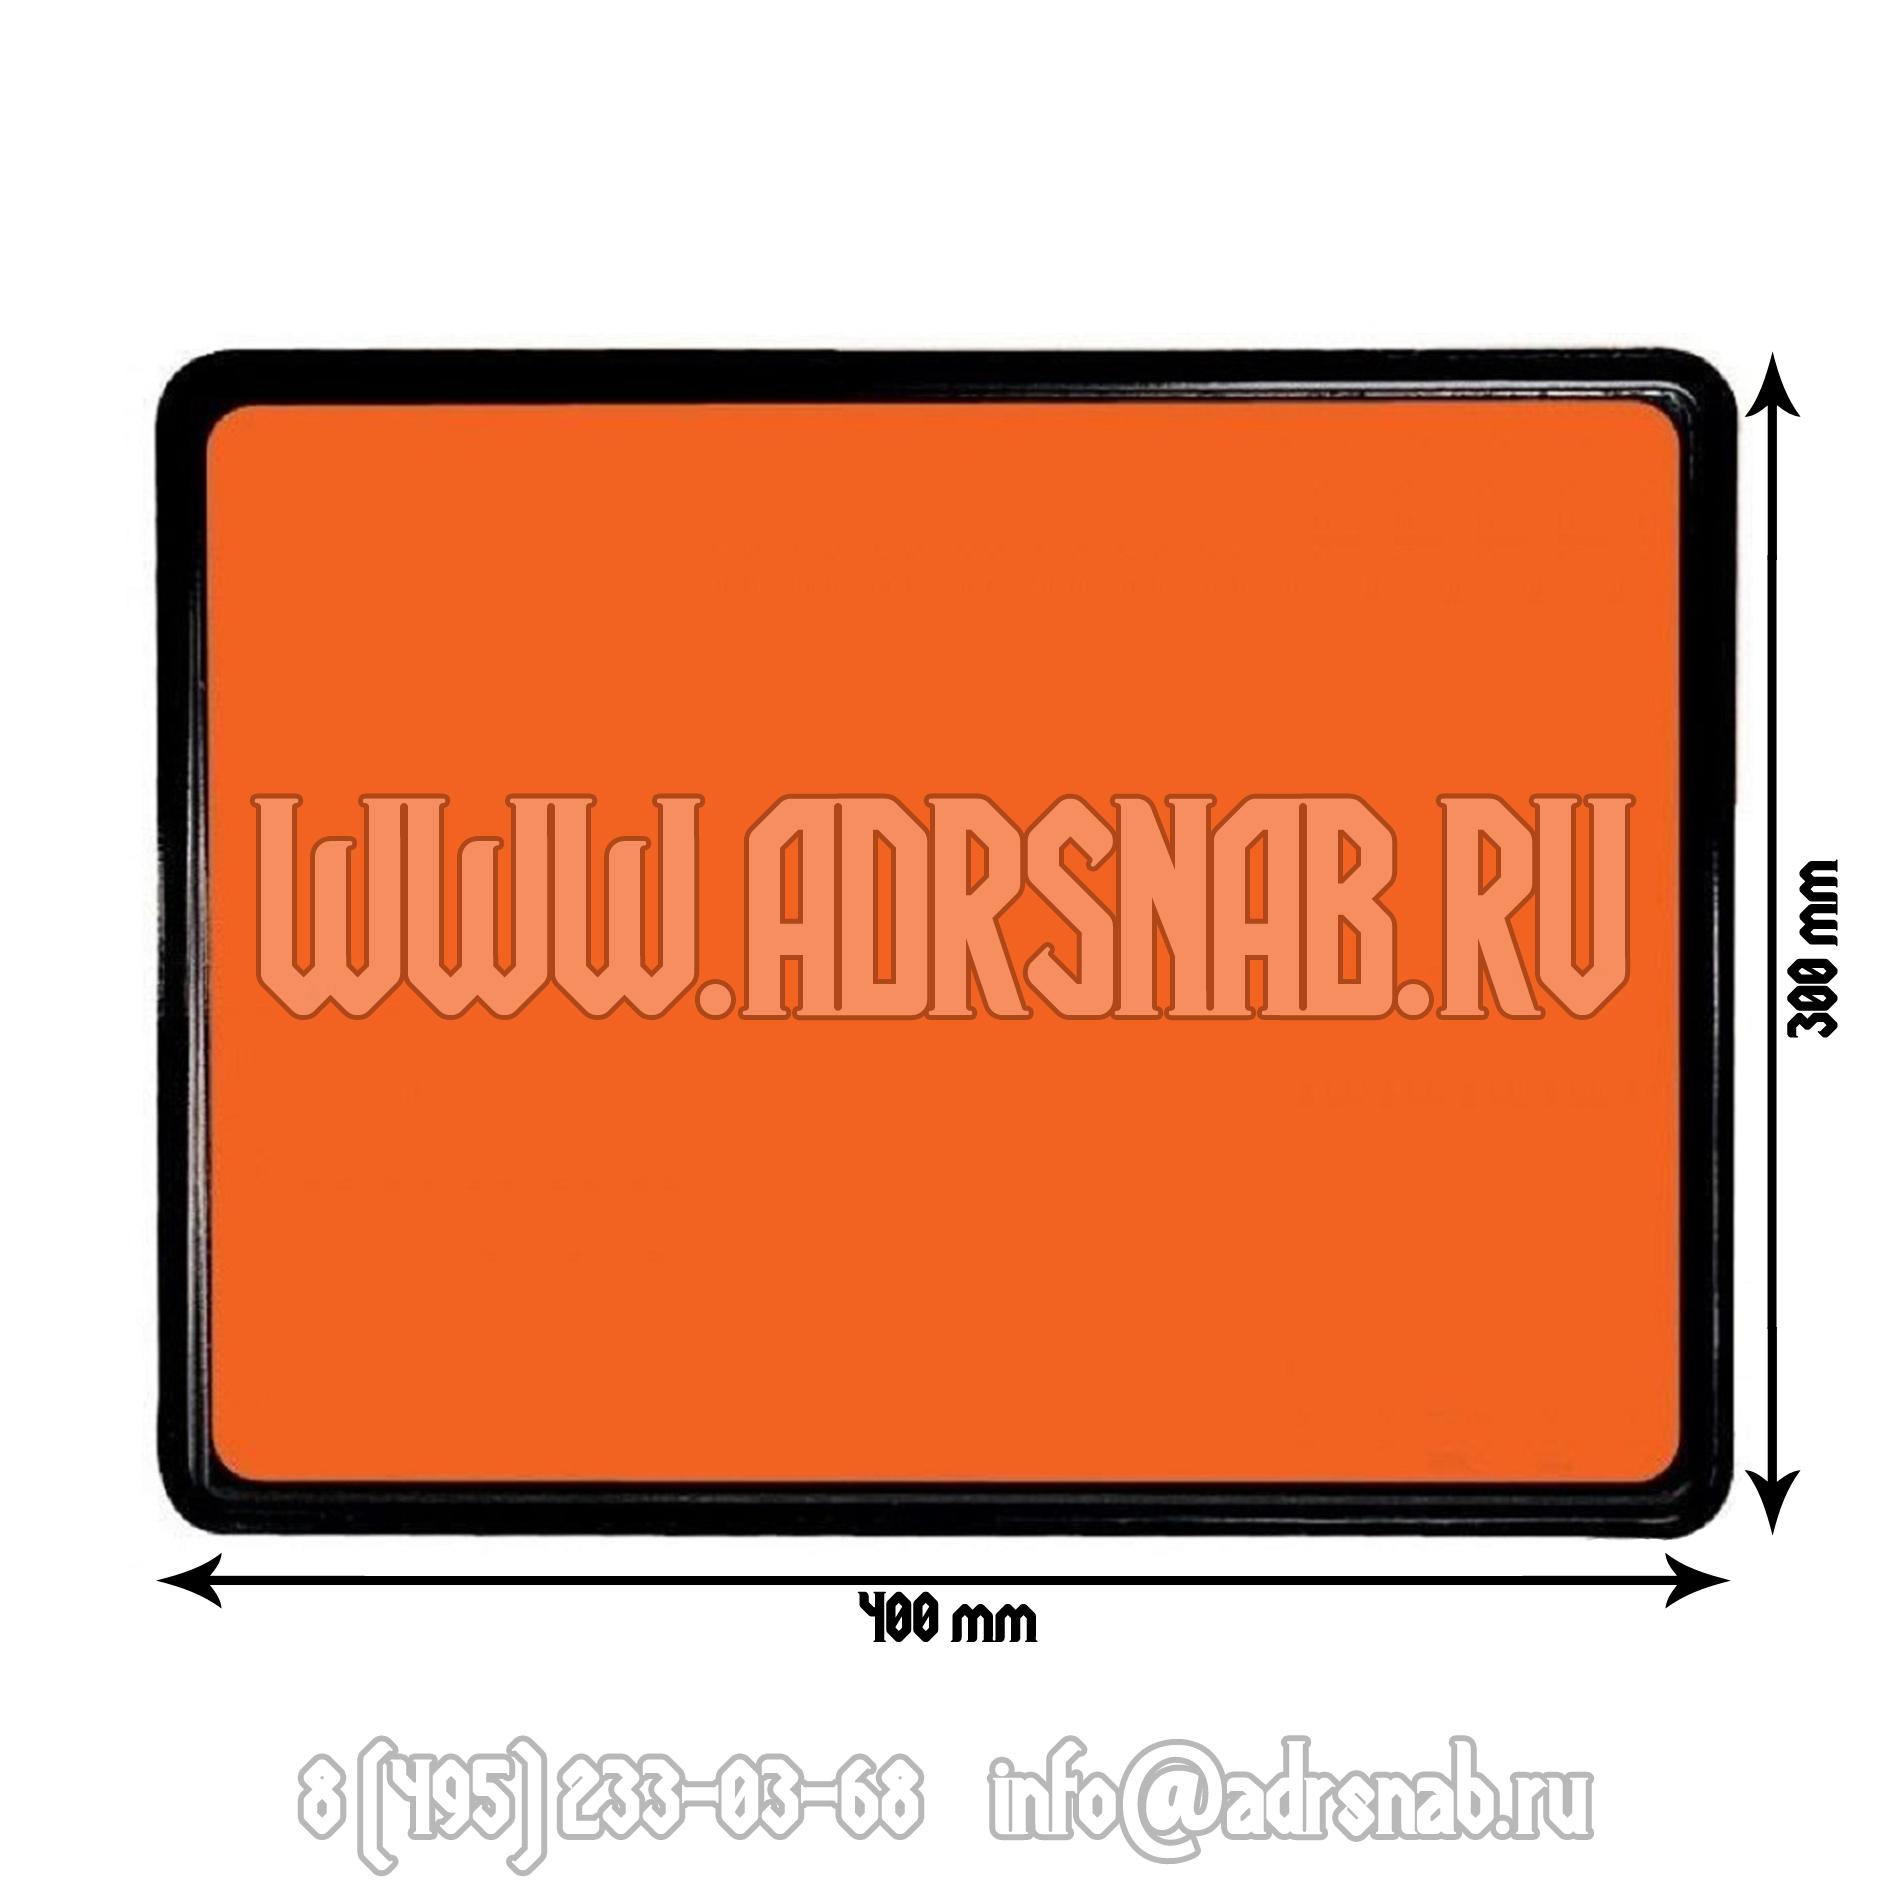 Табличка оранжевая нейтральная размеры